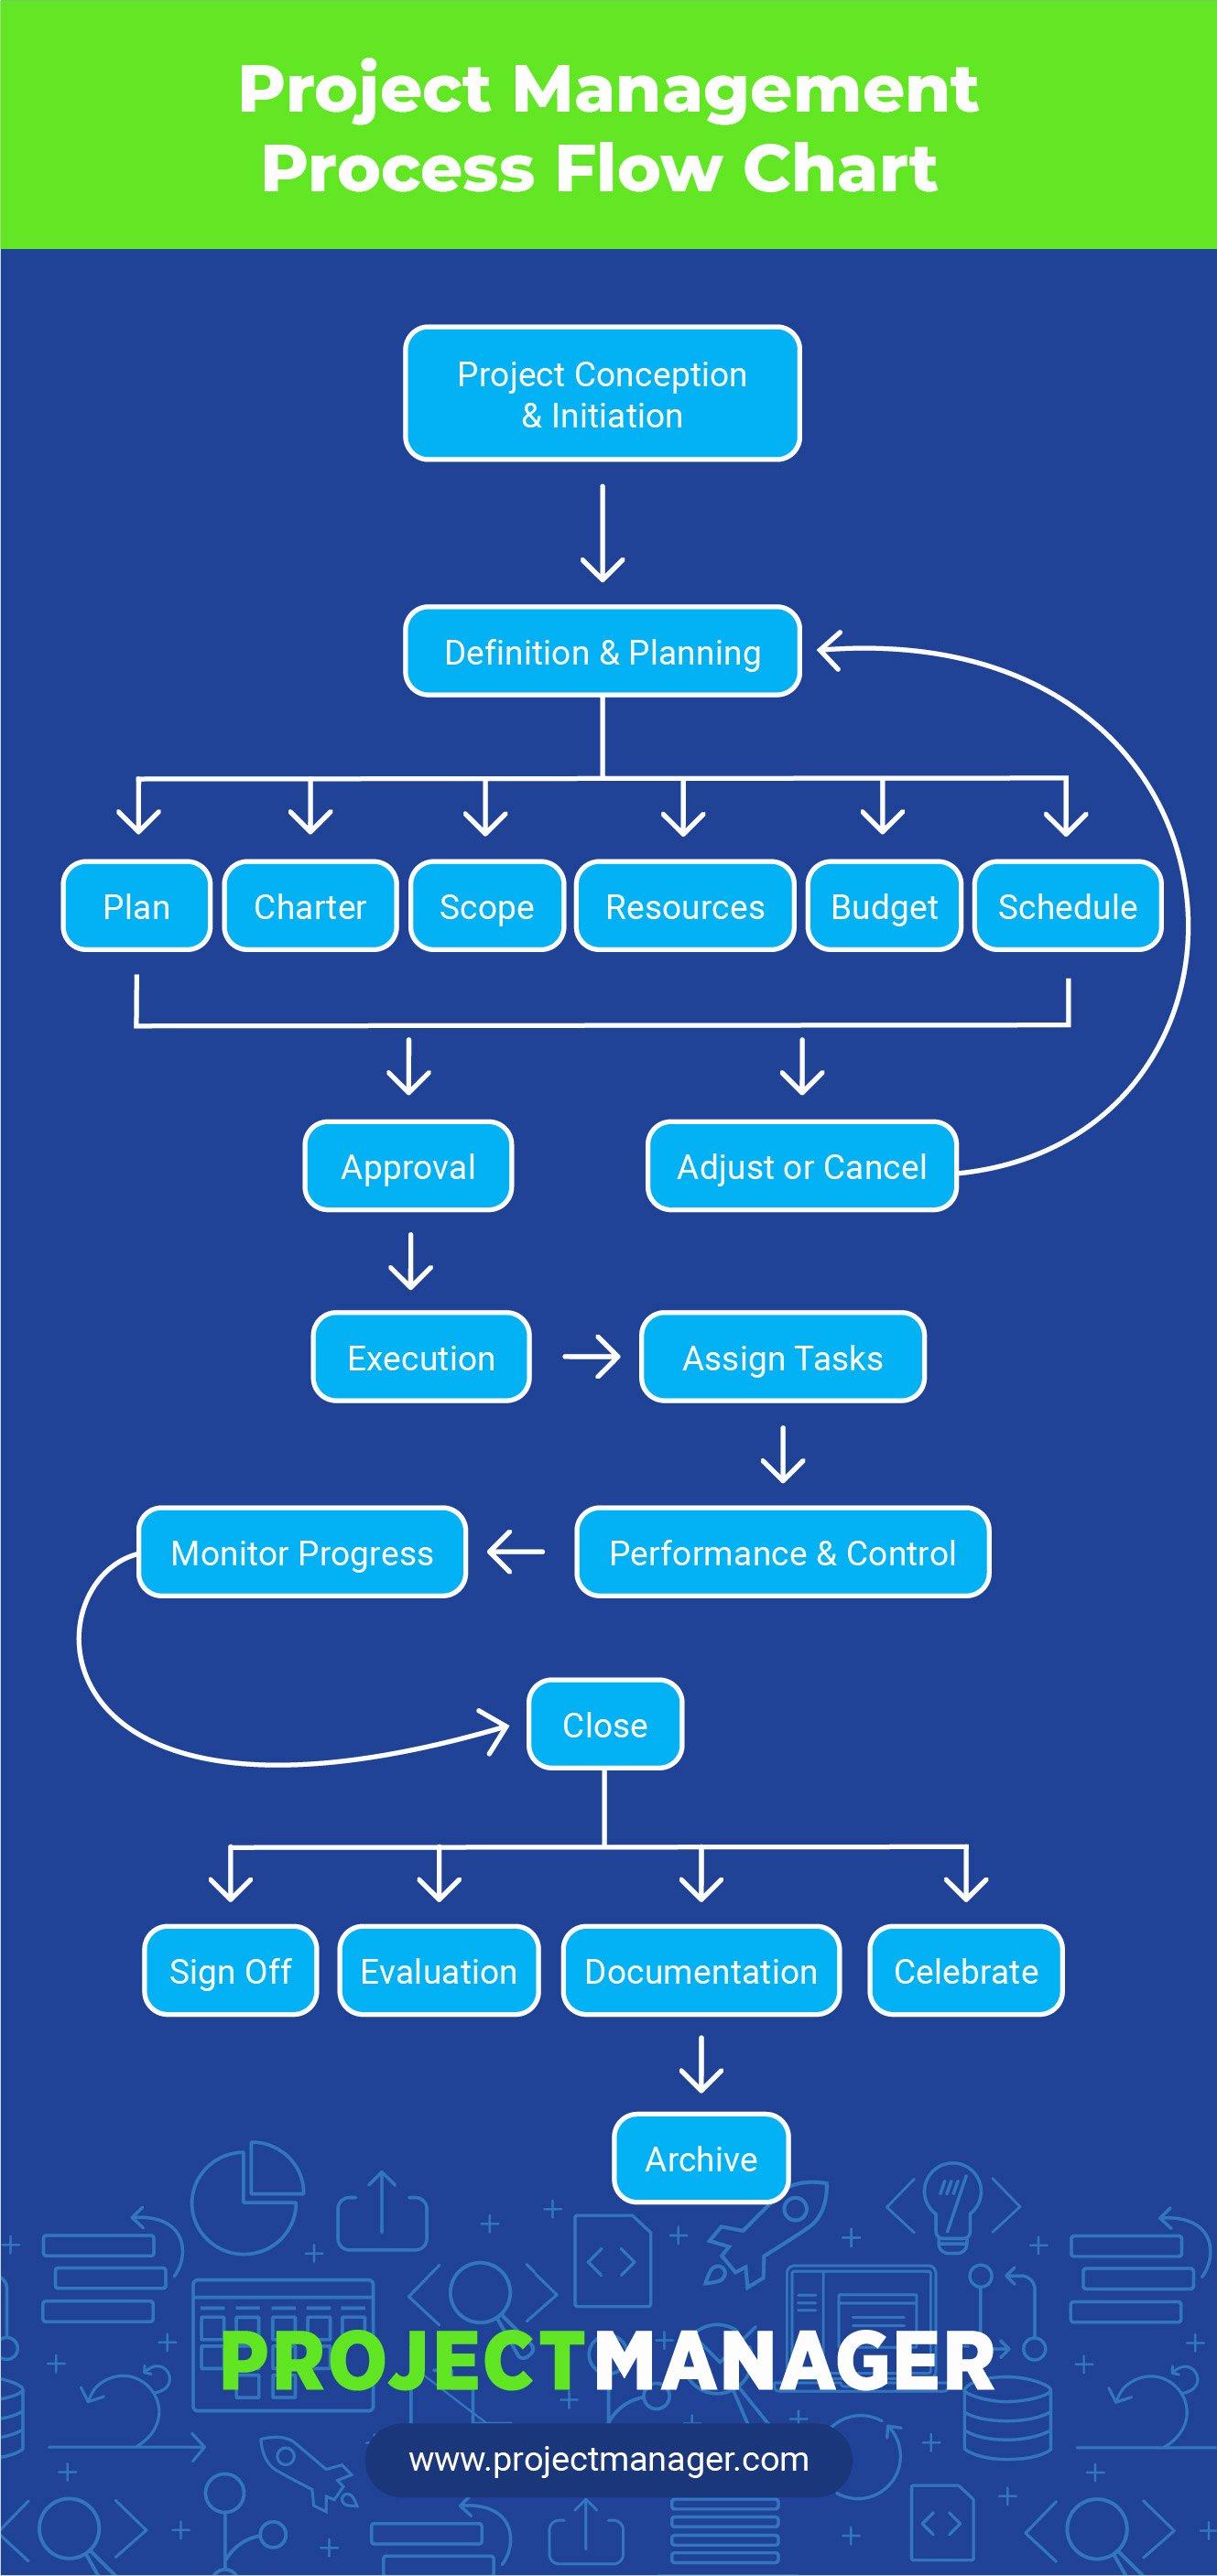 Project Management Flow Chart Template Beautiful Sample Project Management Flow Chart